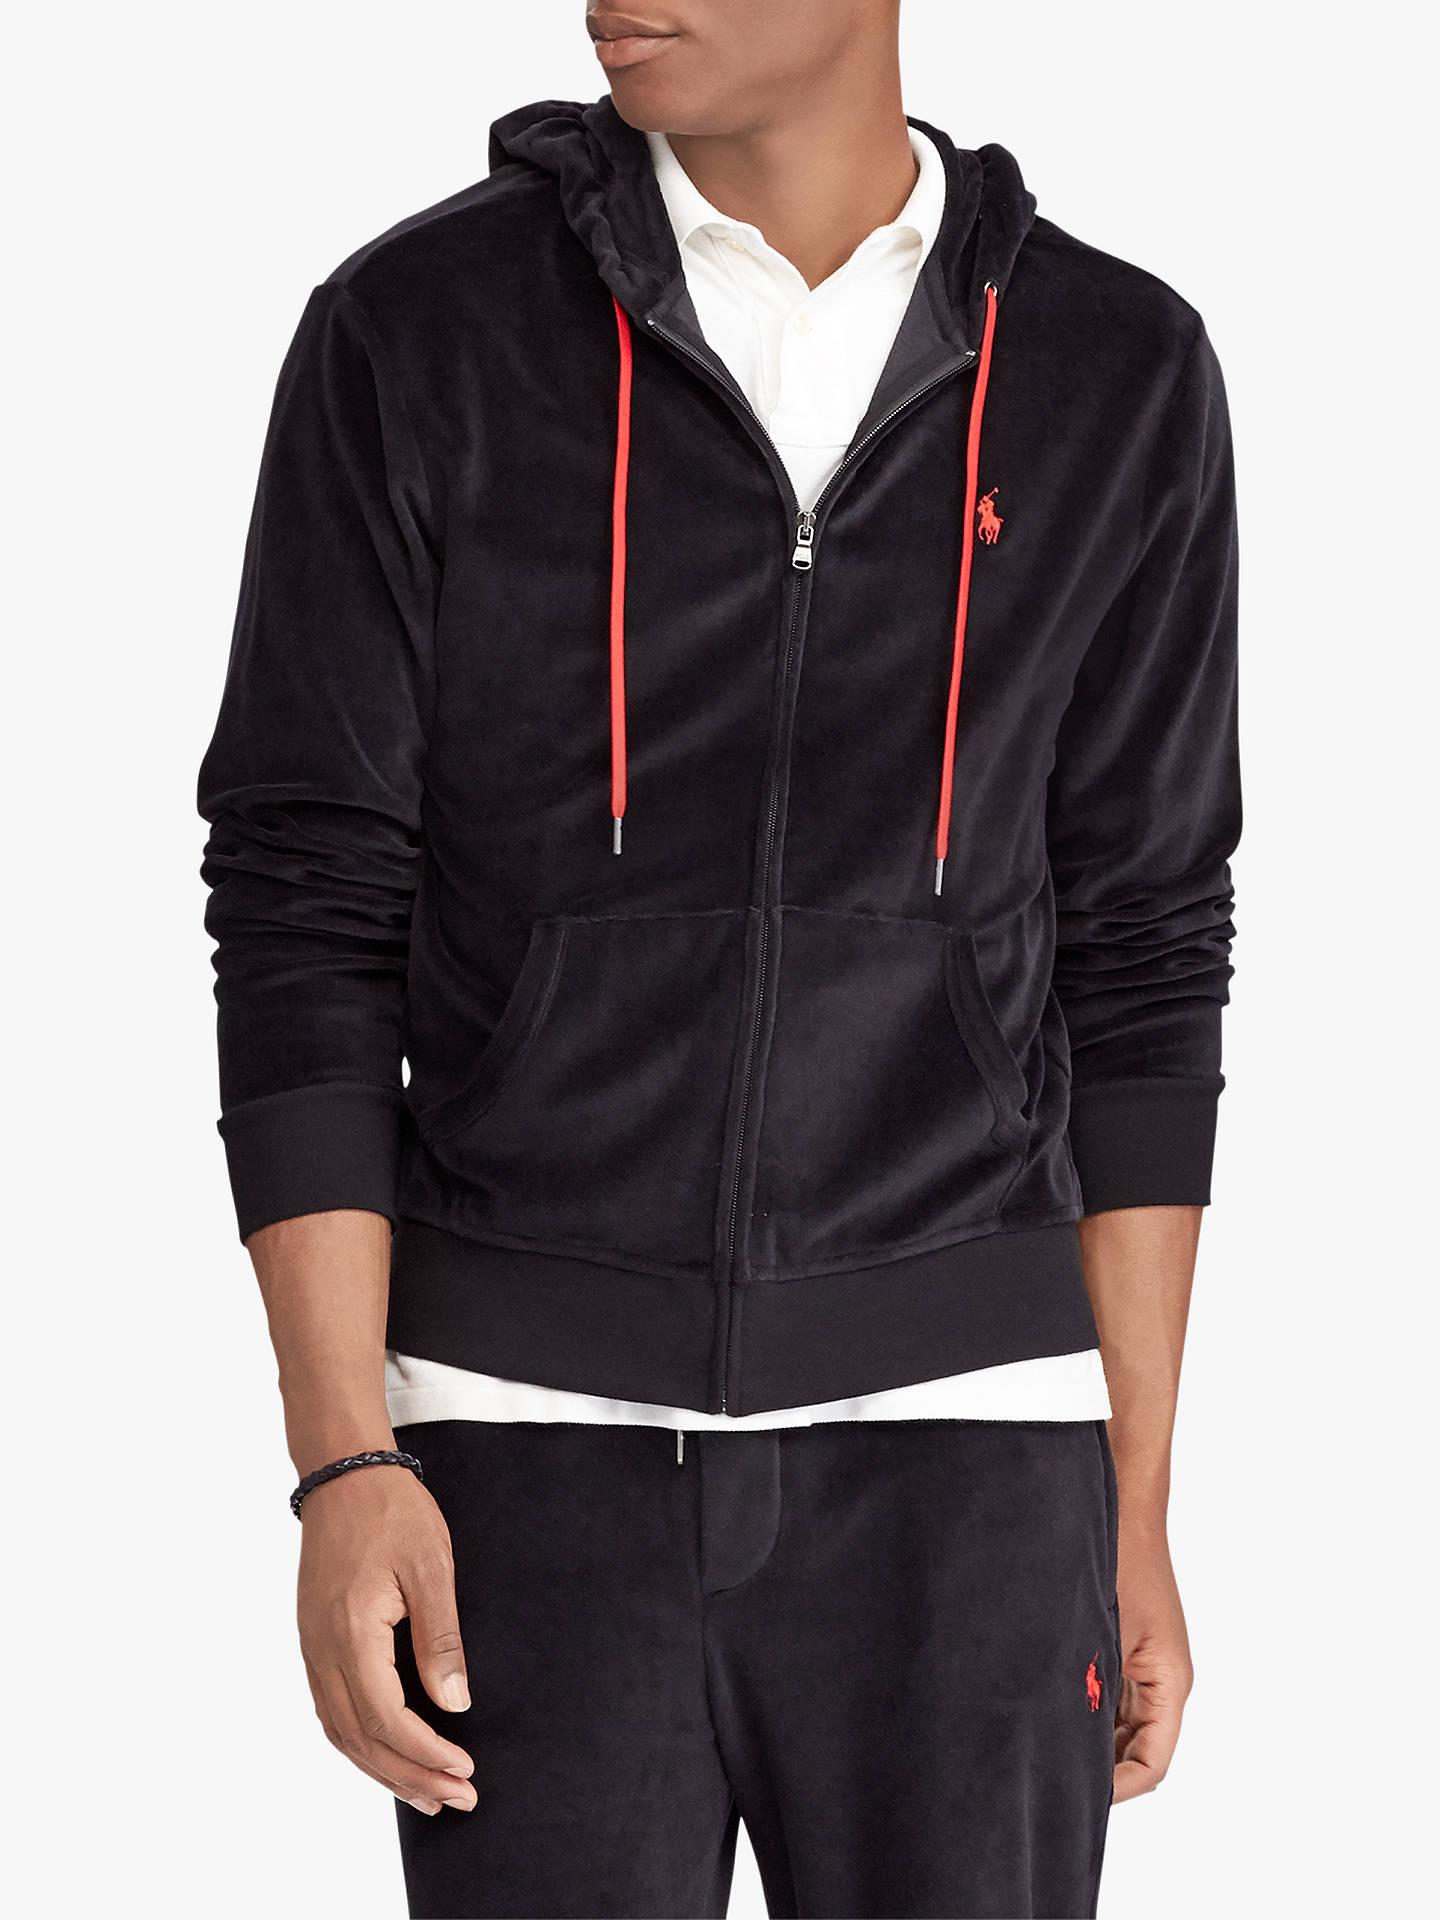 d62c51f2ba86 ... sweden buypolo ralph lauren velour hoodie polo black m online at  johnlewis bc613 a25dd